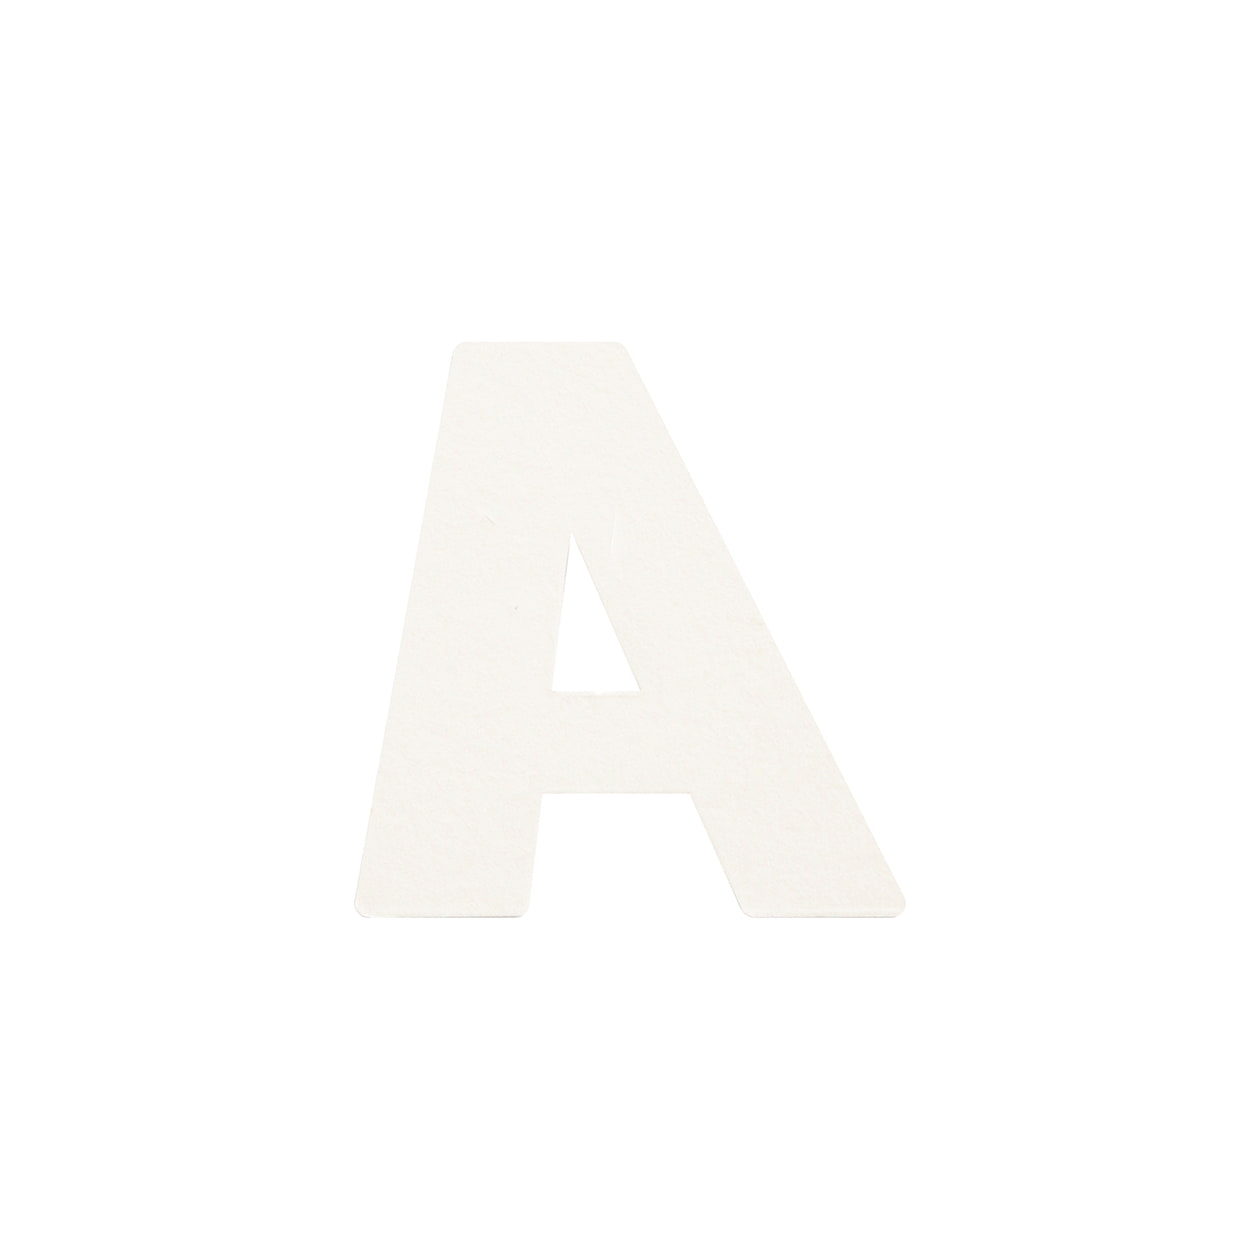 No.395ボード A7カードDC 文字A シルバー